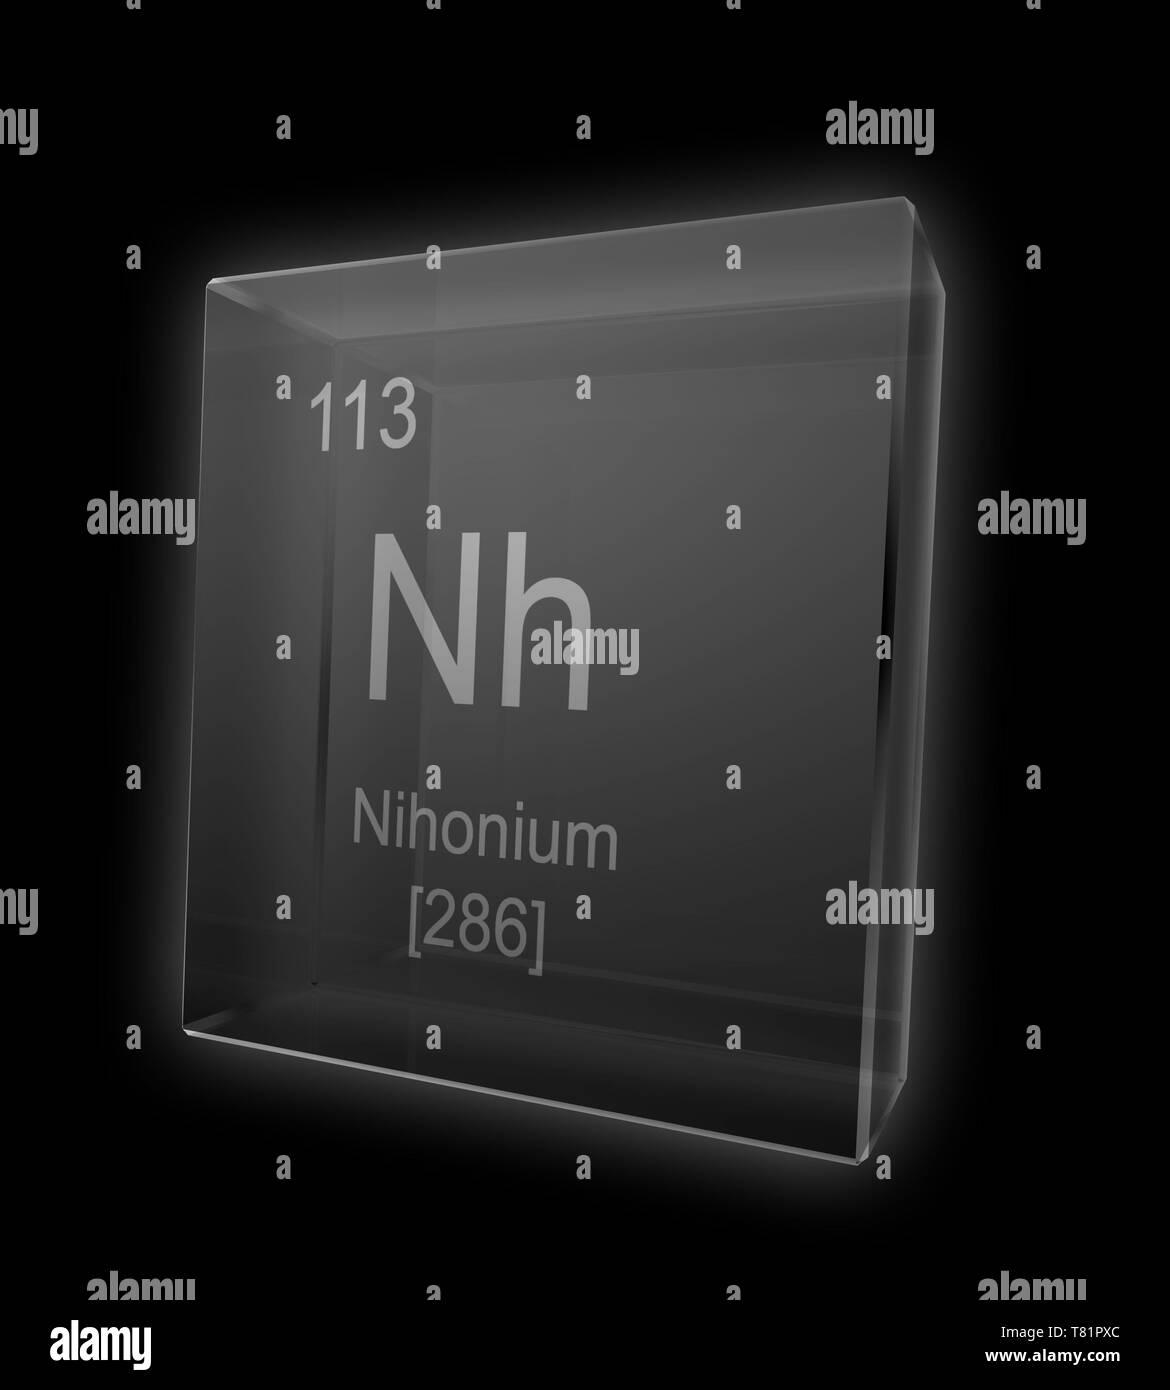 Nihonium, Chemical Element Symbol, Illustration - Stock Image